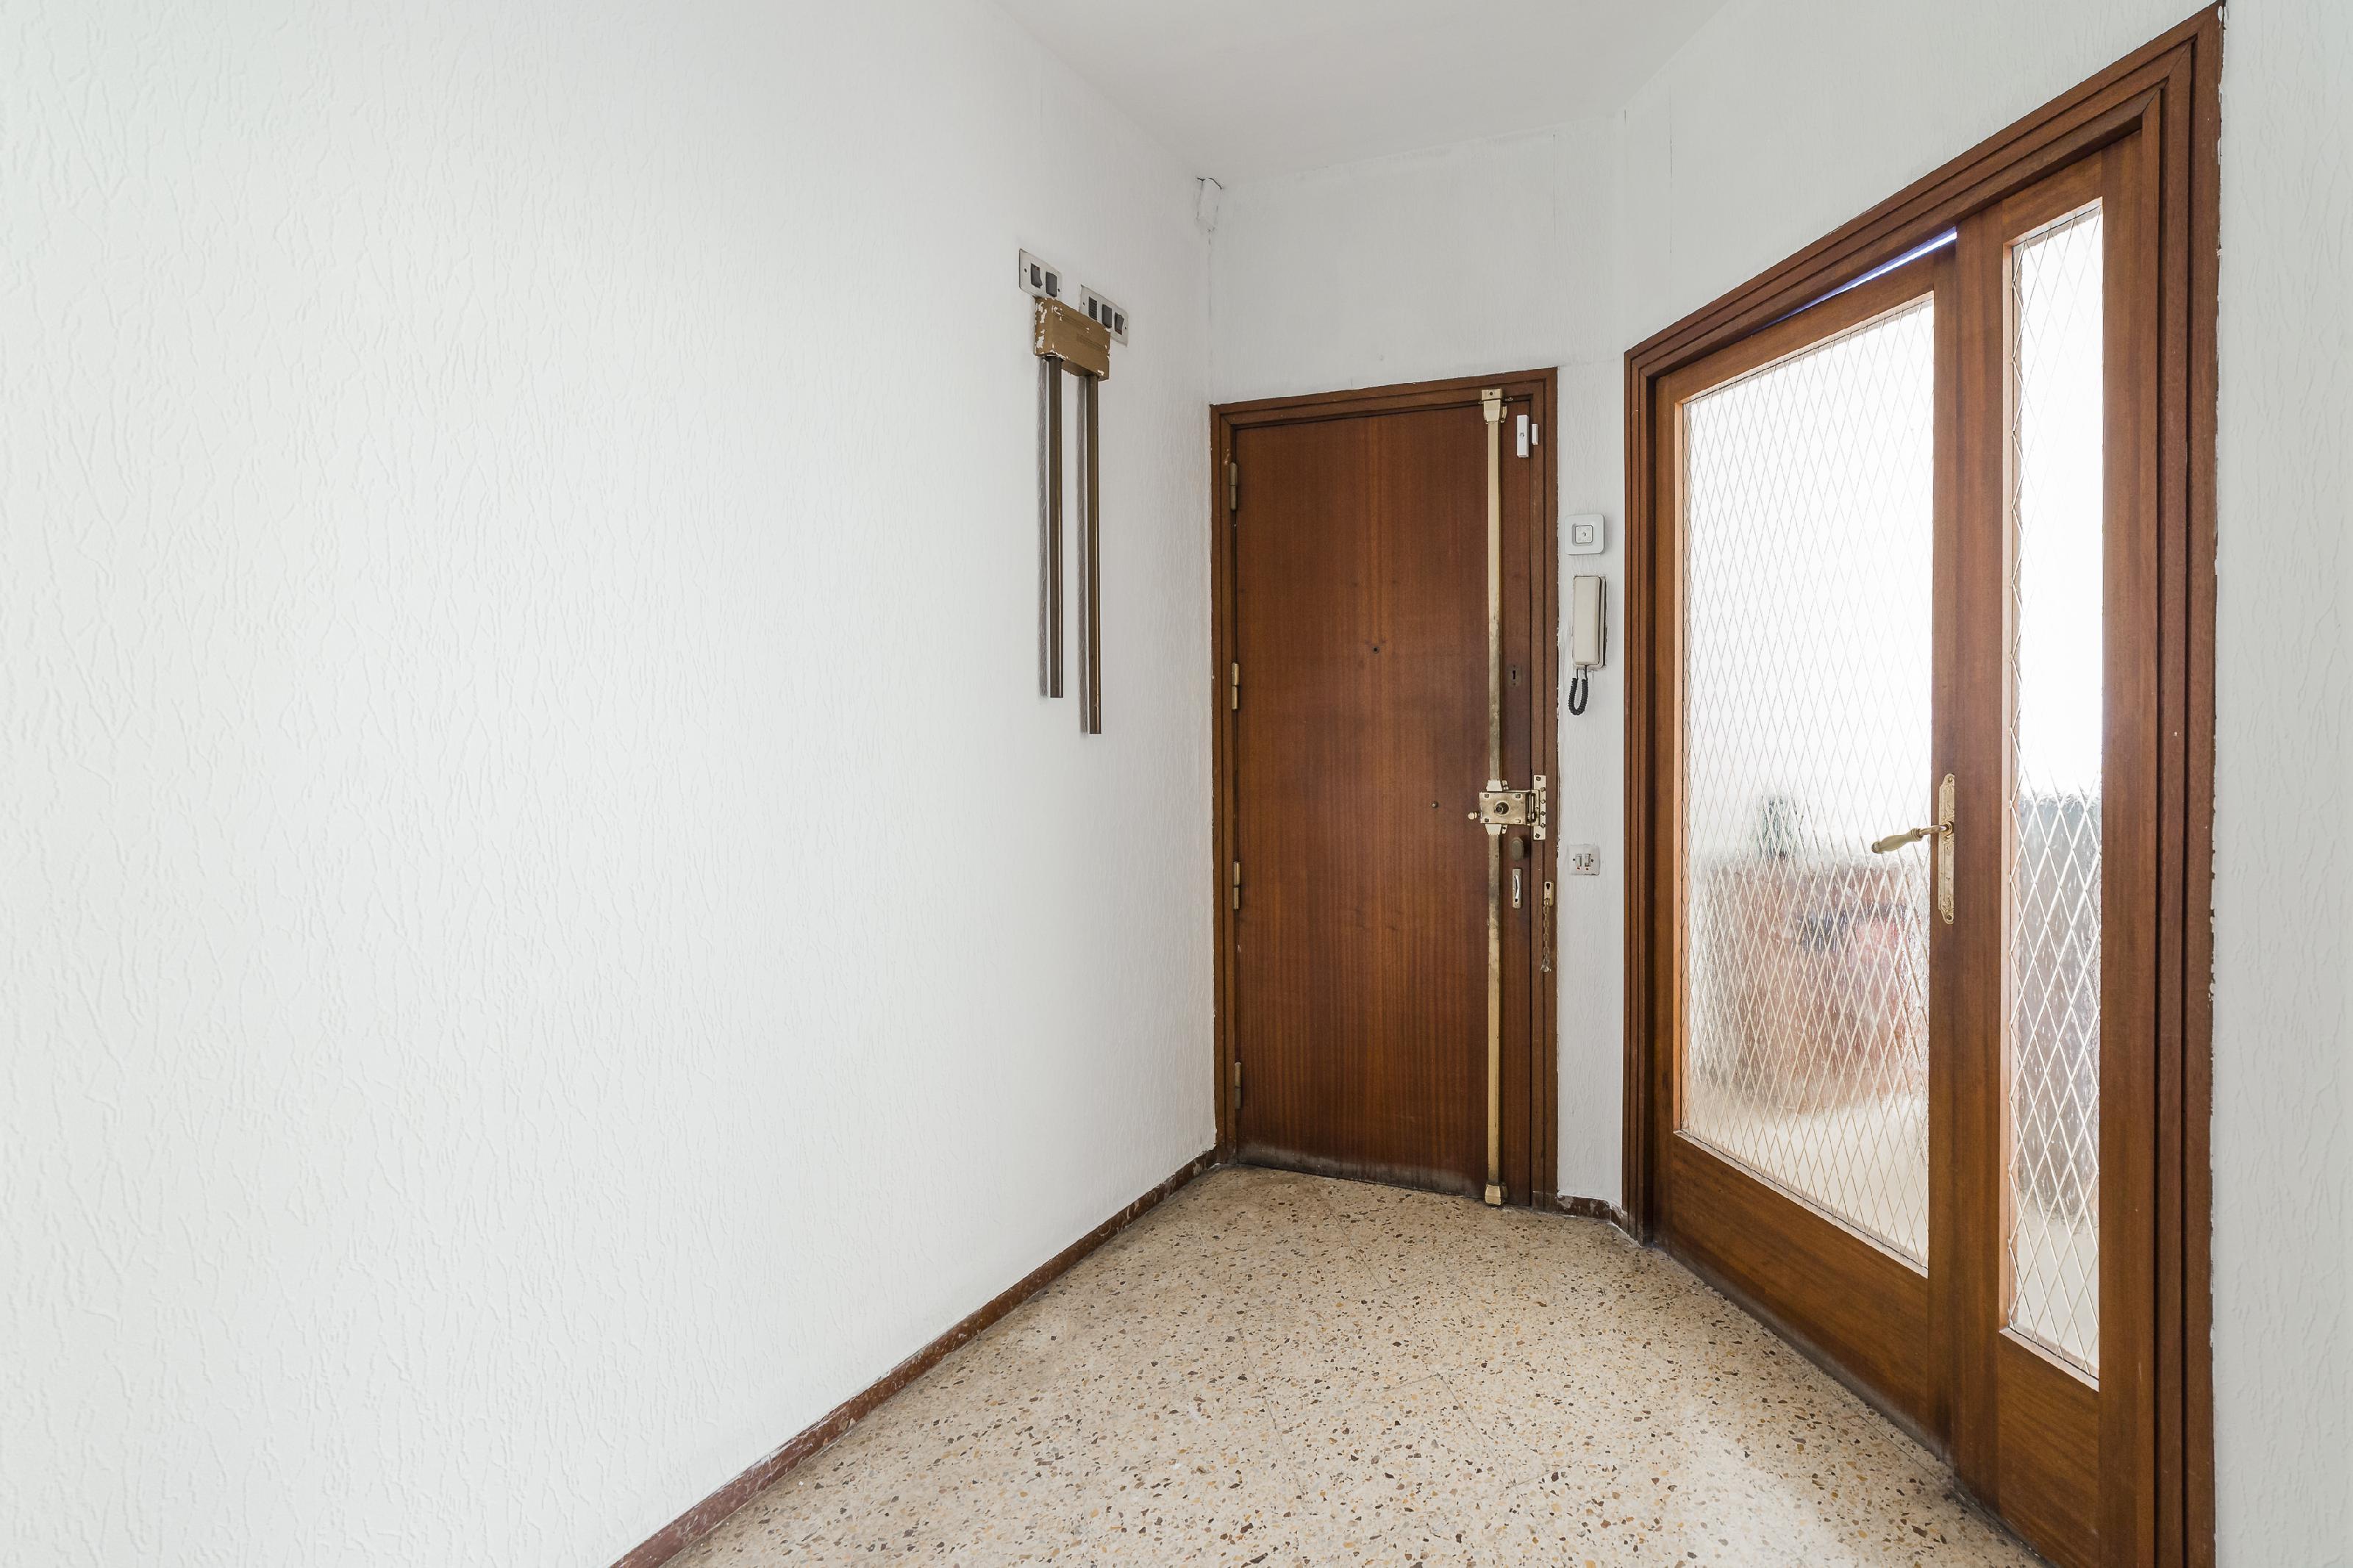 247624 Flat for sale in Eixample, Sant Antoni 9